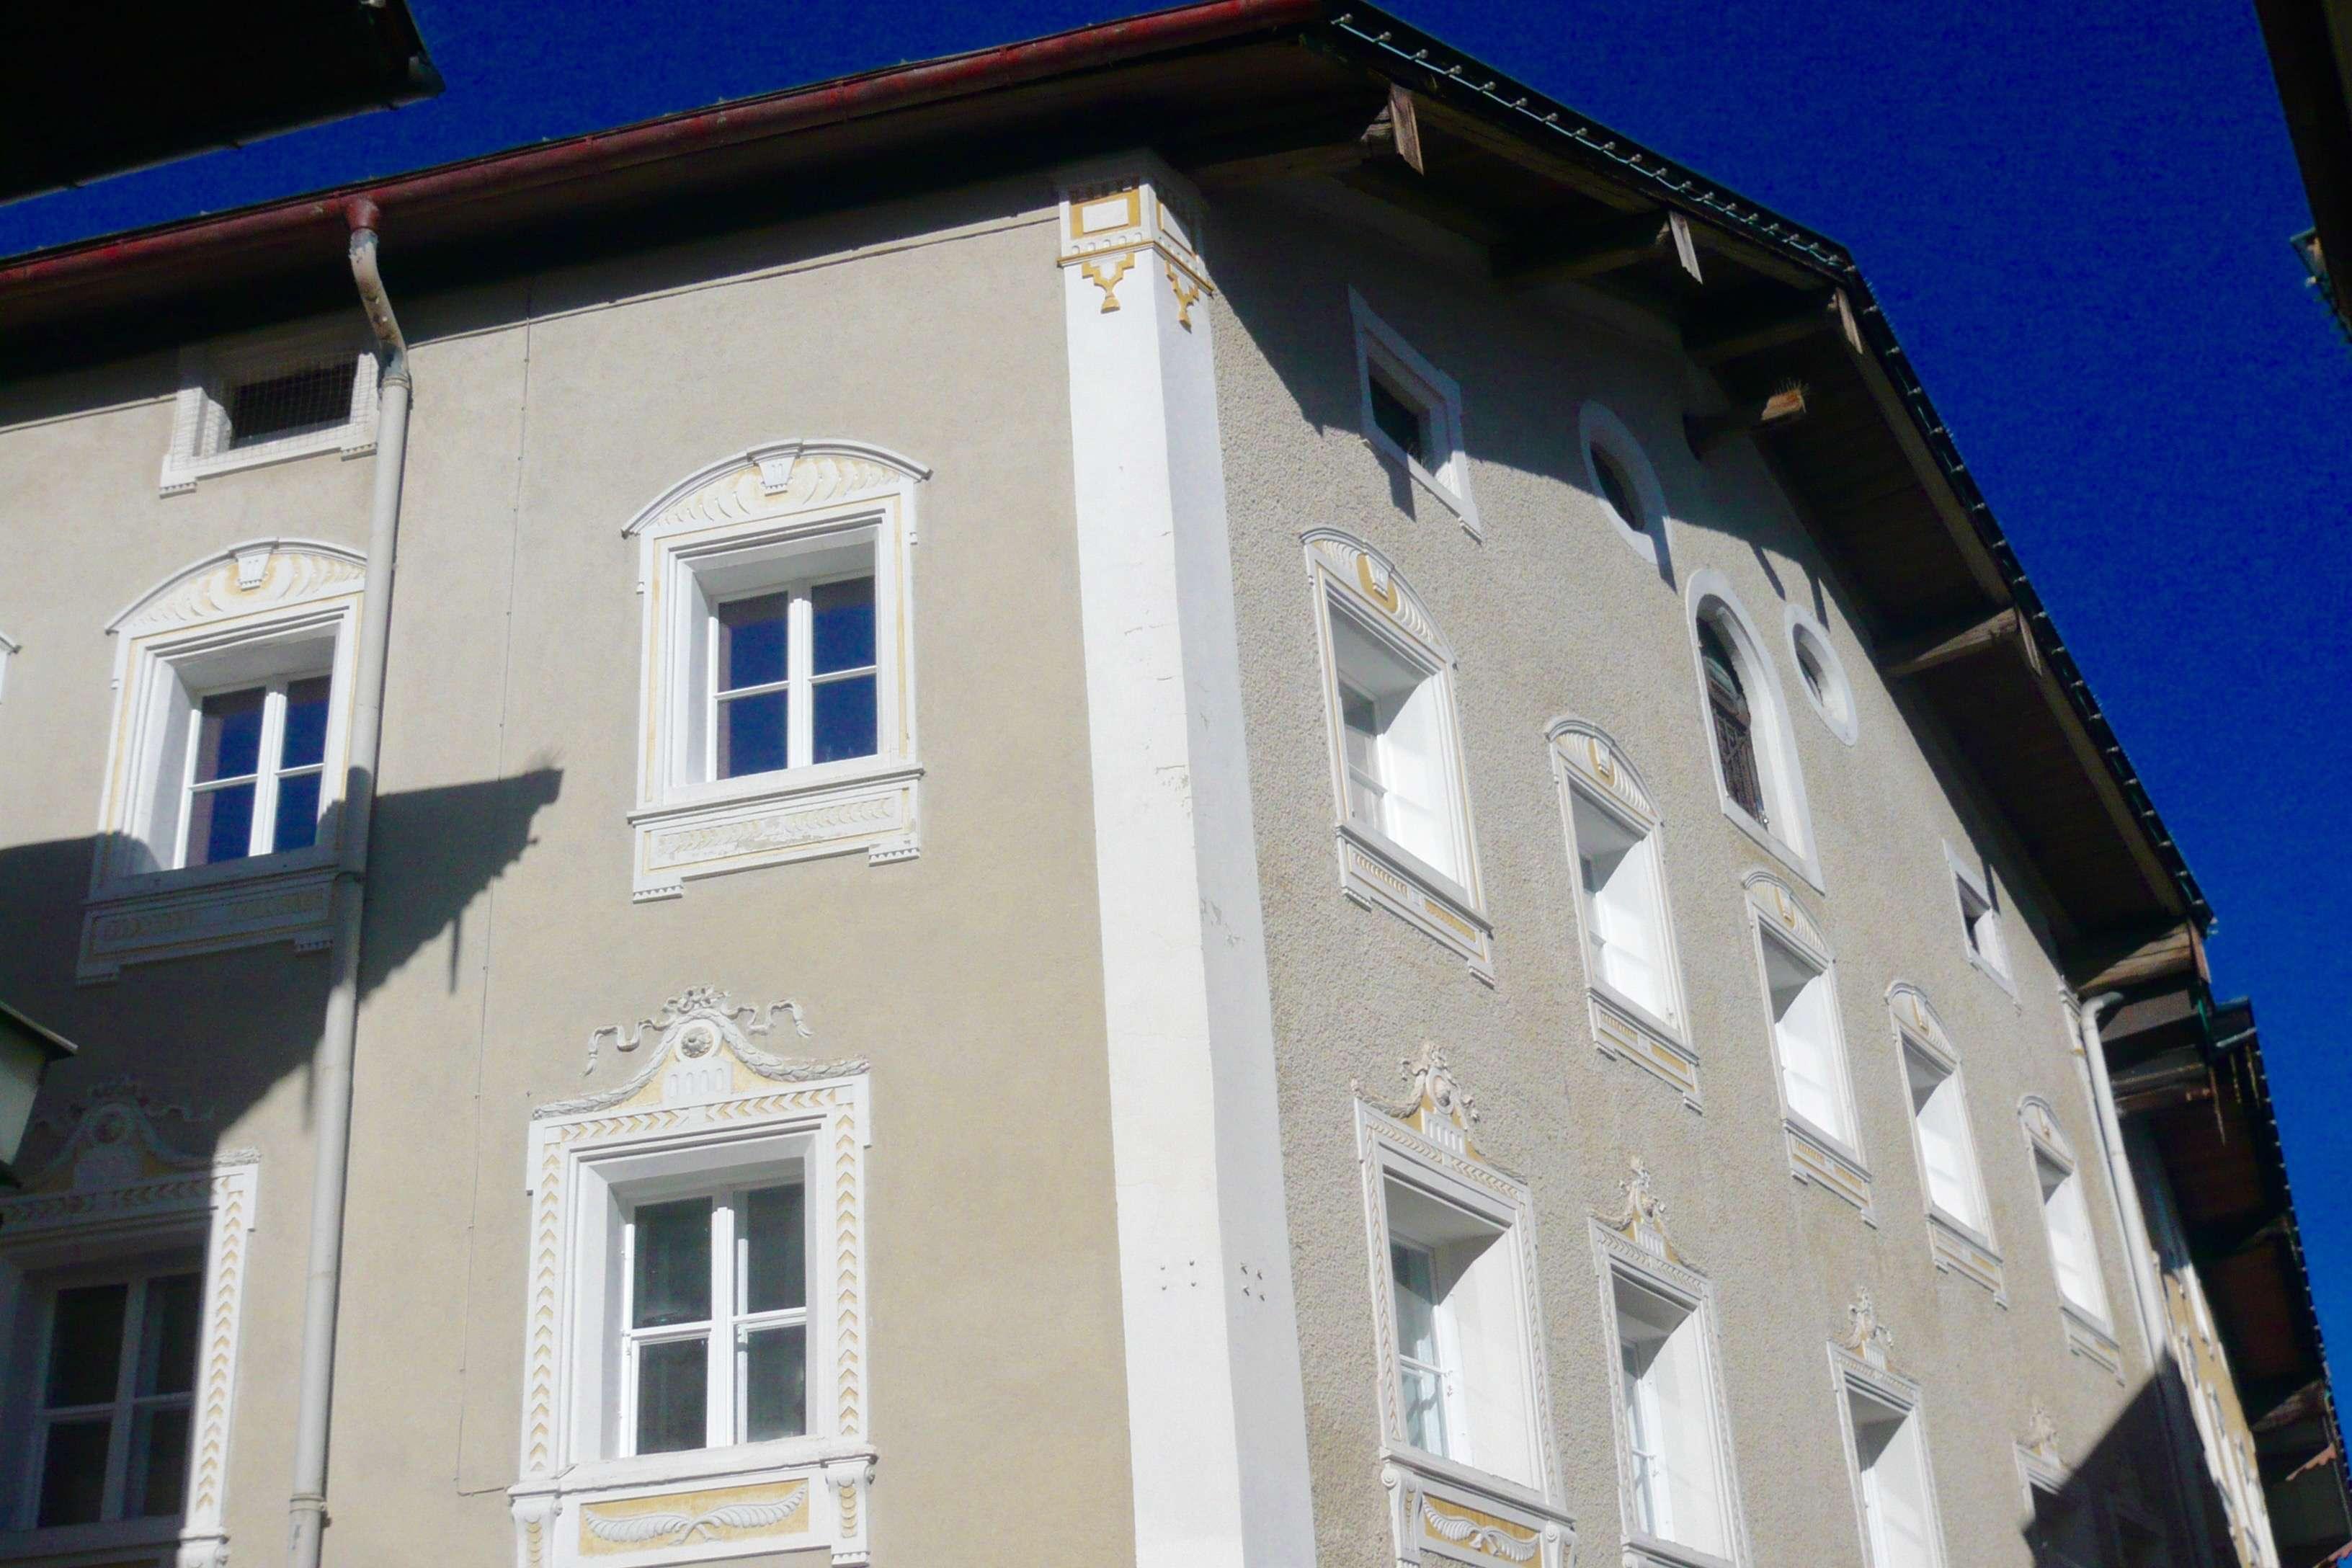 Berchtesgaden - Historischer Marktplatz: Besonders Wohnen in Berchtesgaden